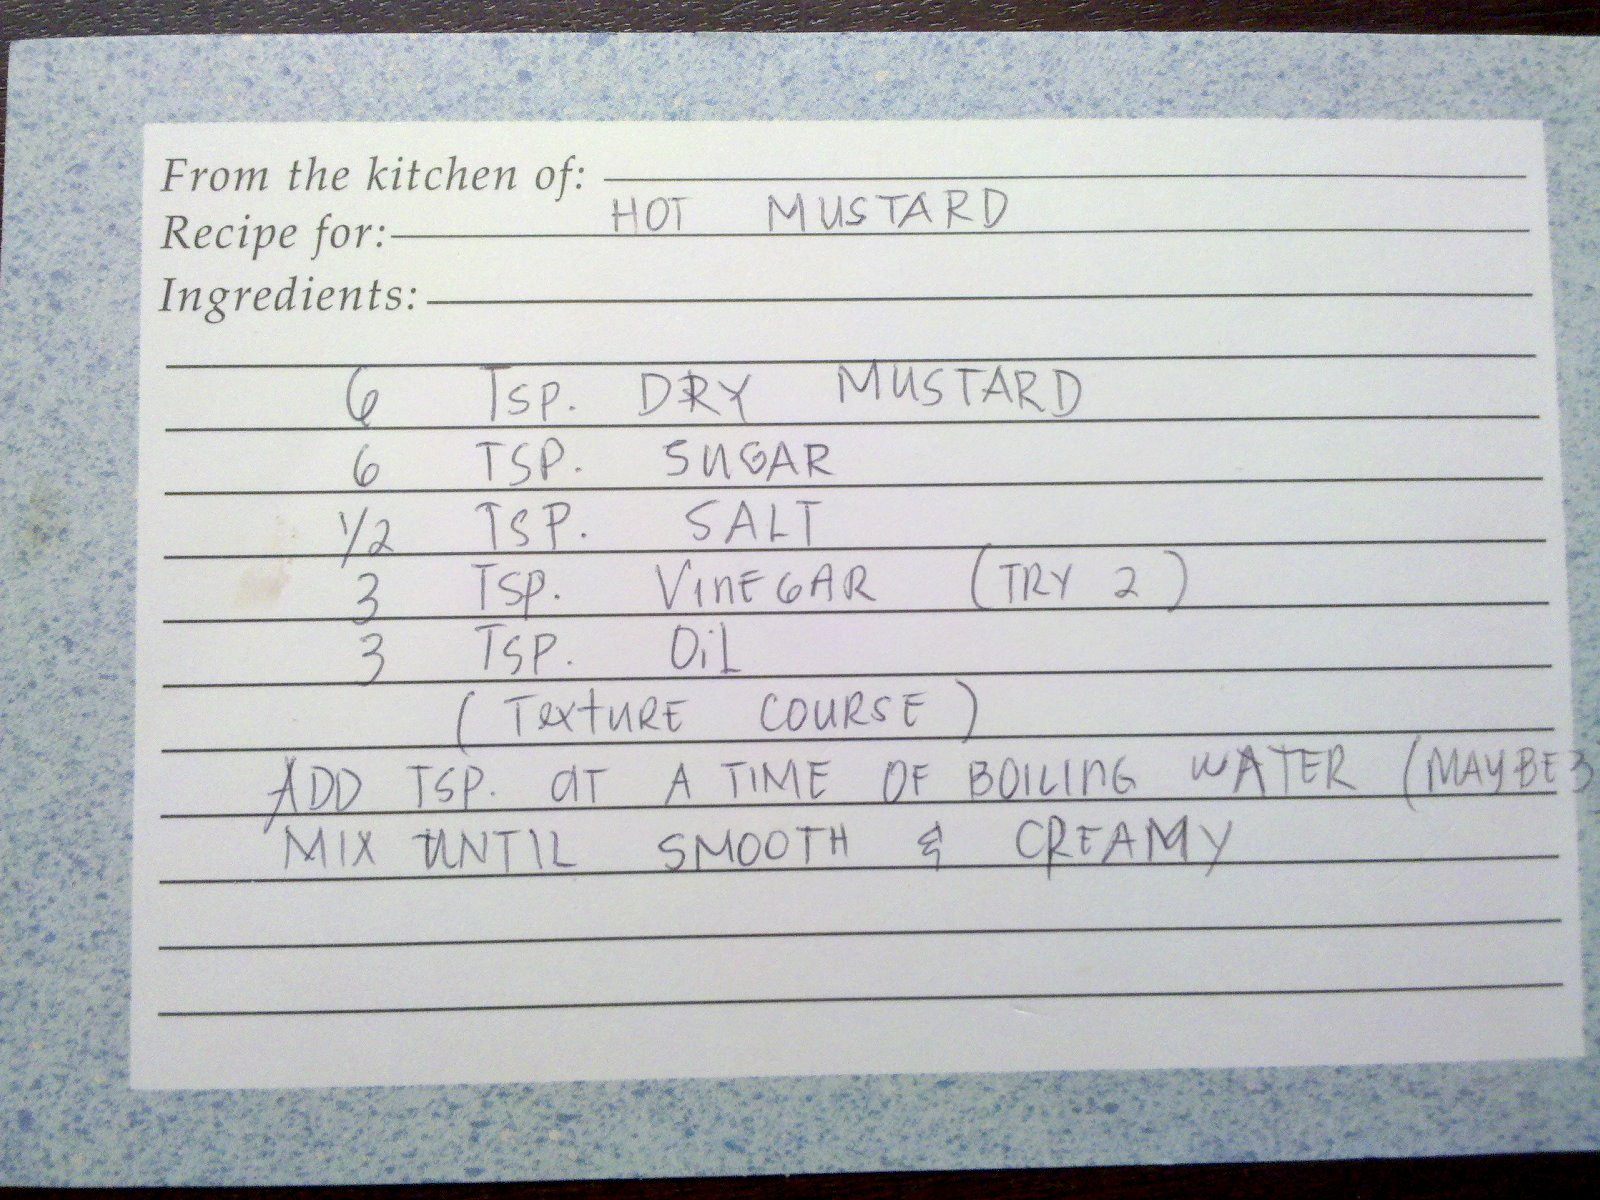 Photo: Hot Mustard Mom's handwritten recipe for Bubbie Lou's Hot Mustard